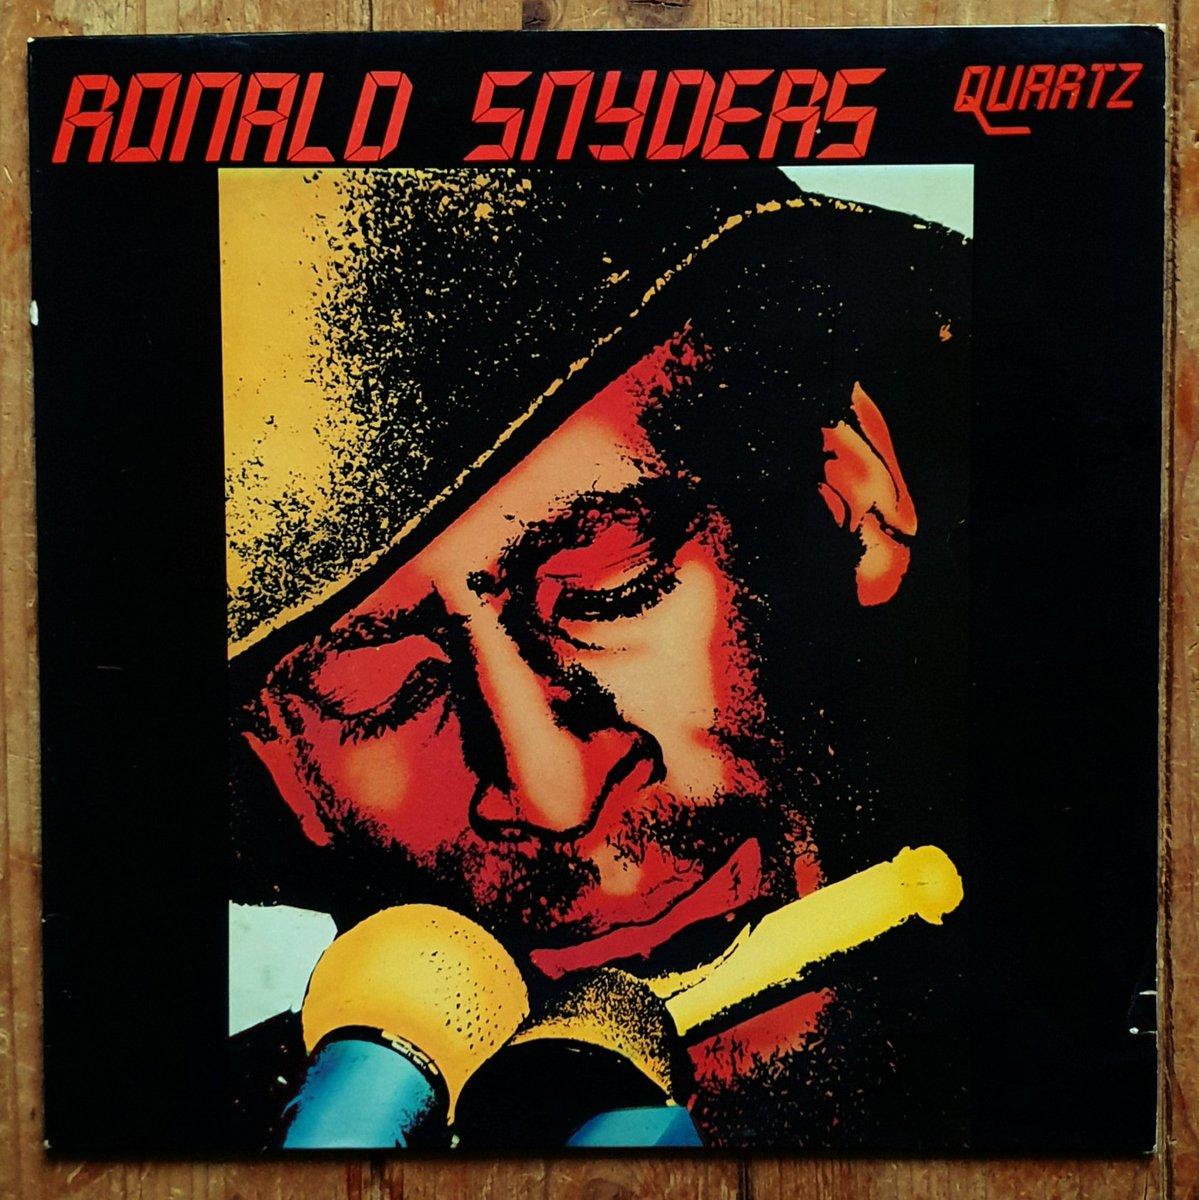 #RonaldSnyders – Quartz Label: #BlackStraightMusic – BSM 0104 Format: #Vinyl #LP Album Country: #Netherlands Released: 1983 Genre: Electronic, #JazzFusion / Soul Style: #JazzFunk #Funk #Kaseko  #percussions #flute #drums #bass #instarecords #rhythms #rarejazz pic.twitter.com/WOm75zzn9a